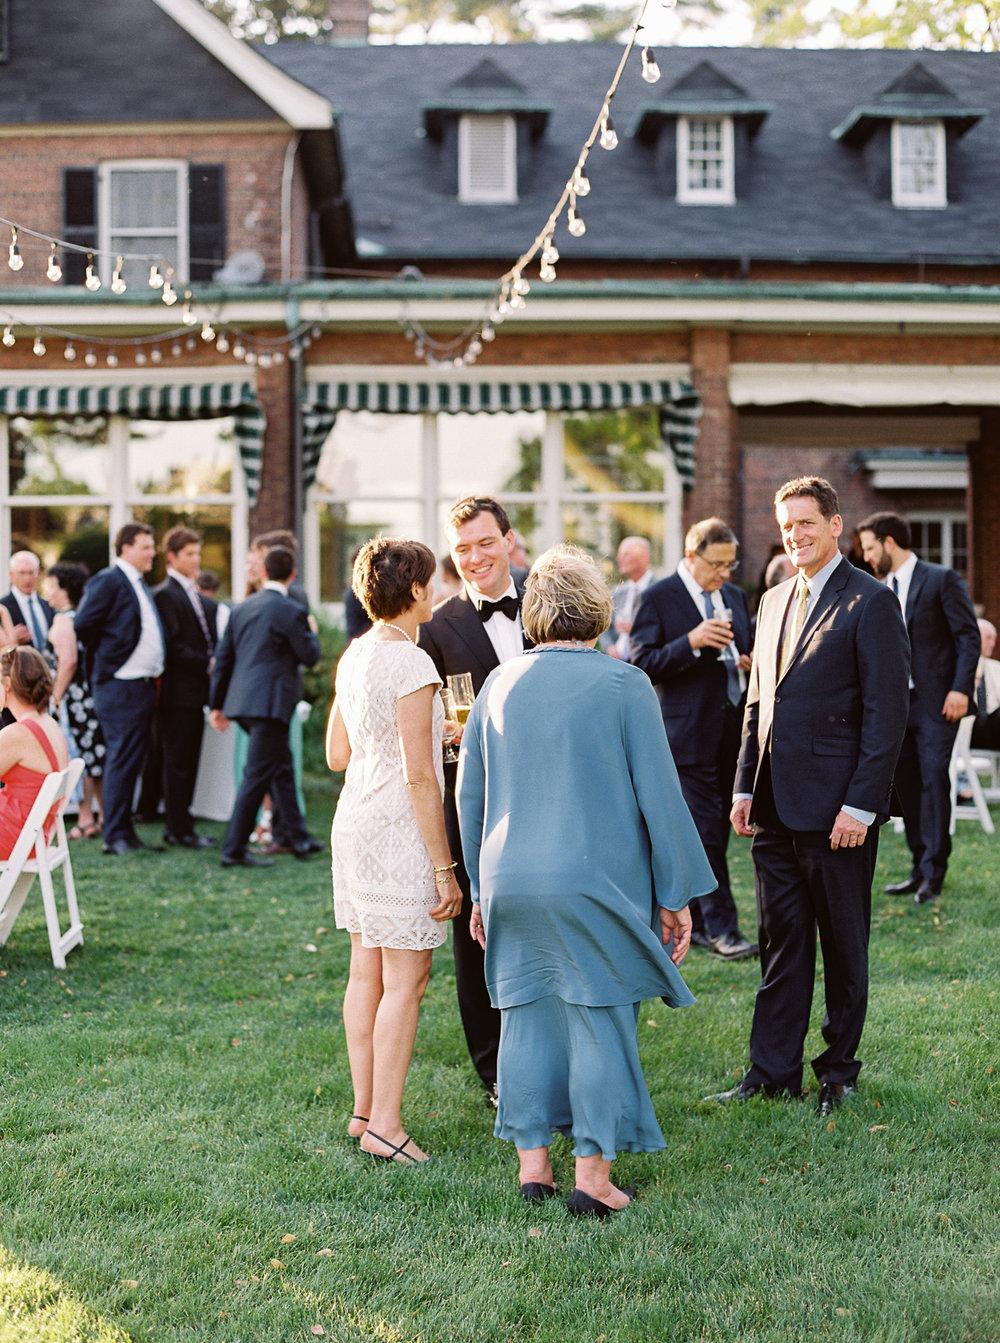 0273-Nadia-Chris-Married-When He Founf Her-Toronto Golf Club.jpg